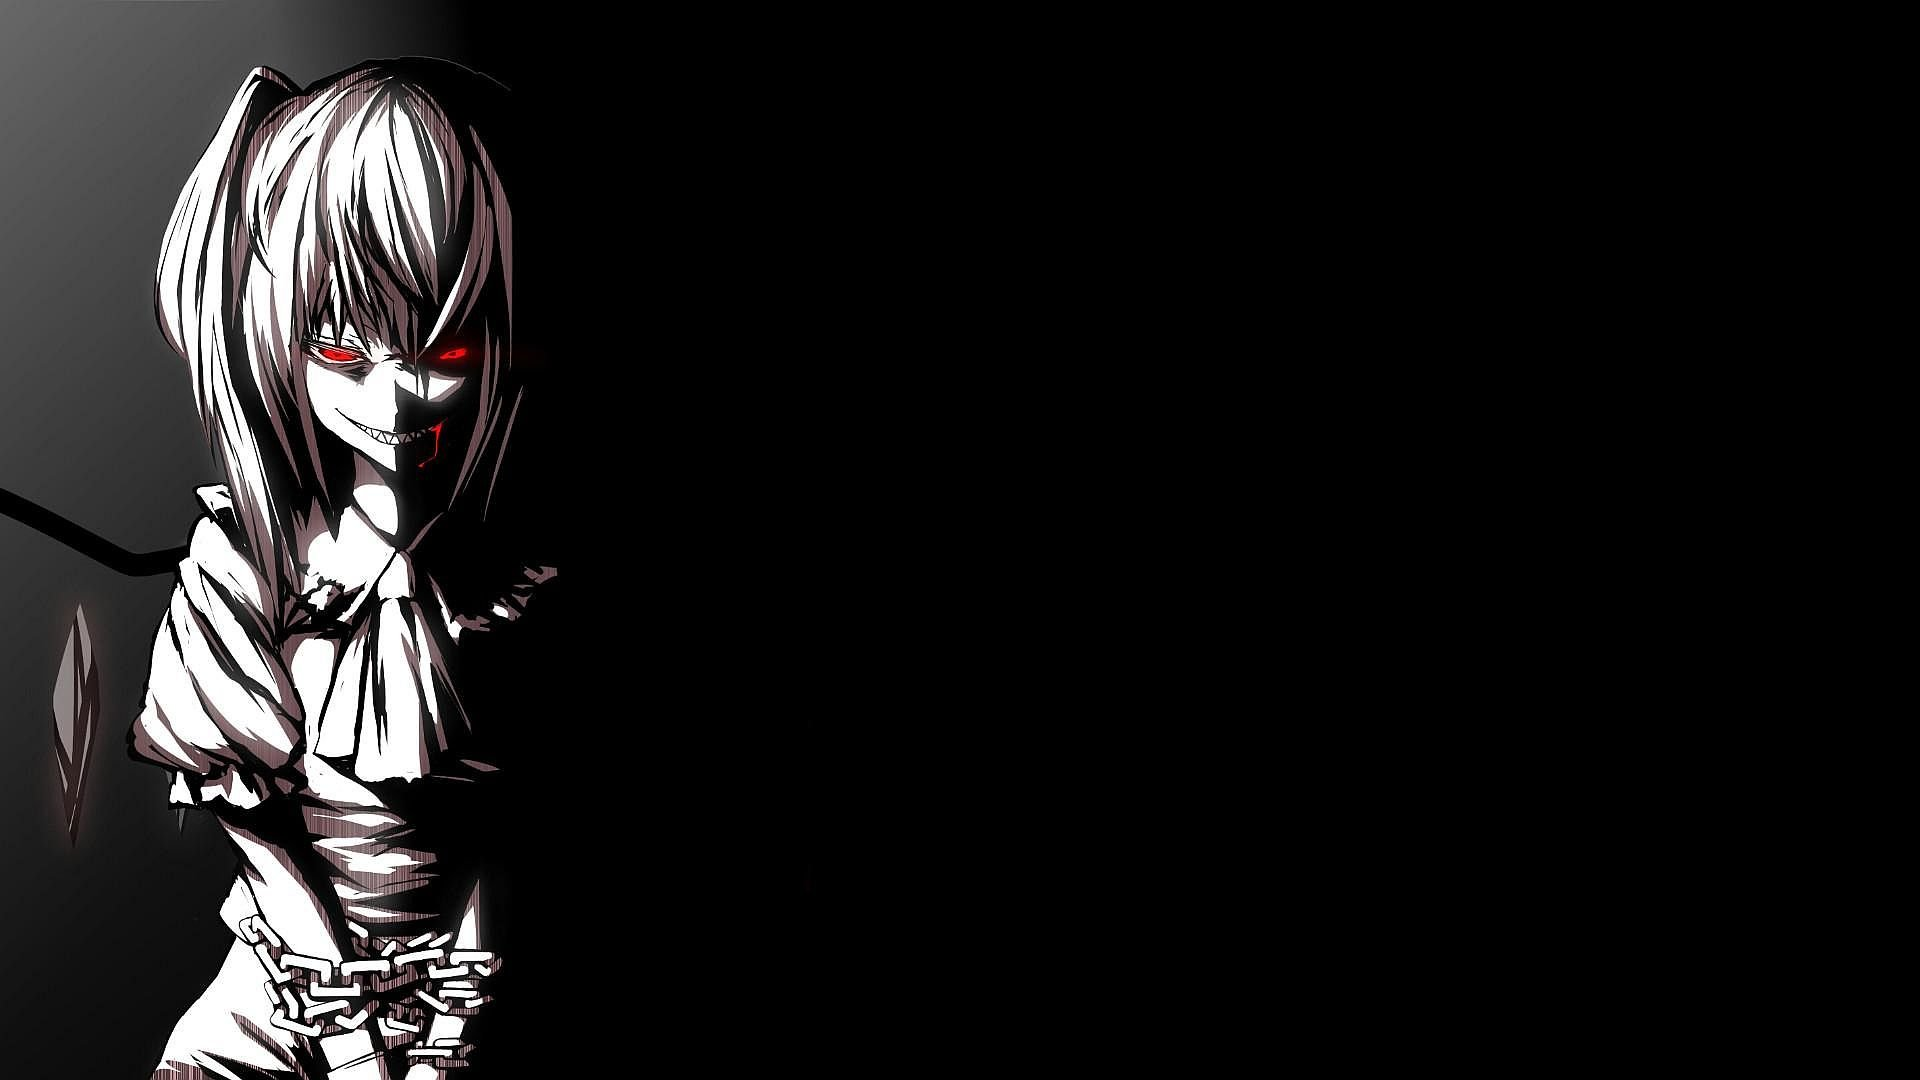 Hd wallpaper anime - Dark Anime Girl Wallpaper 9691 Hd Wallpapers In Anime Imagesci Com